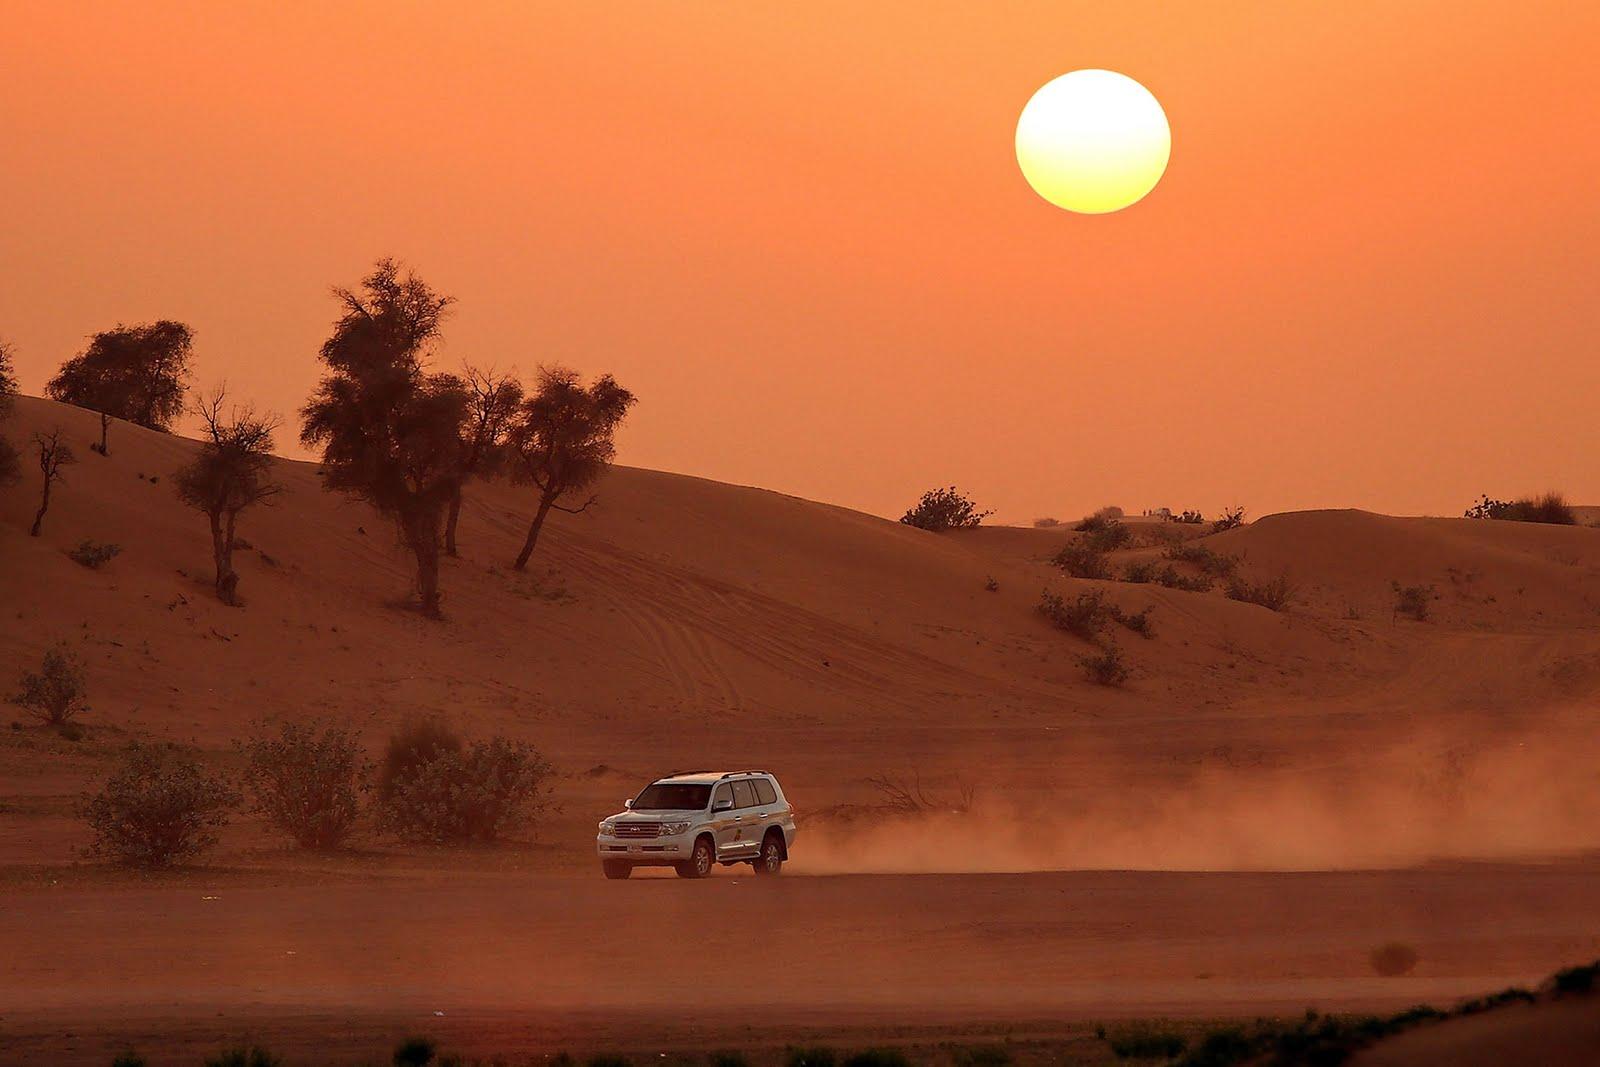 MY HOTEL LIFE: Dune Bashing in Dubai